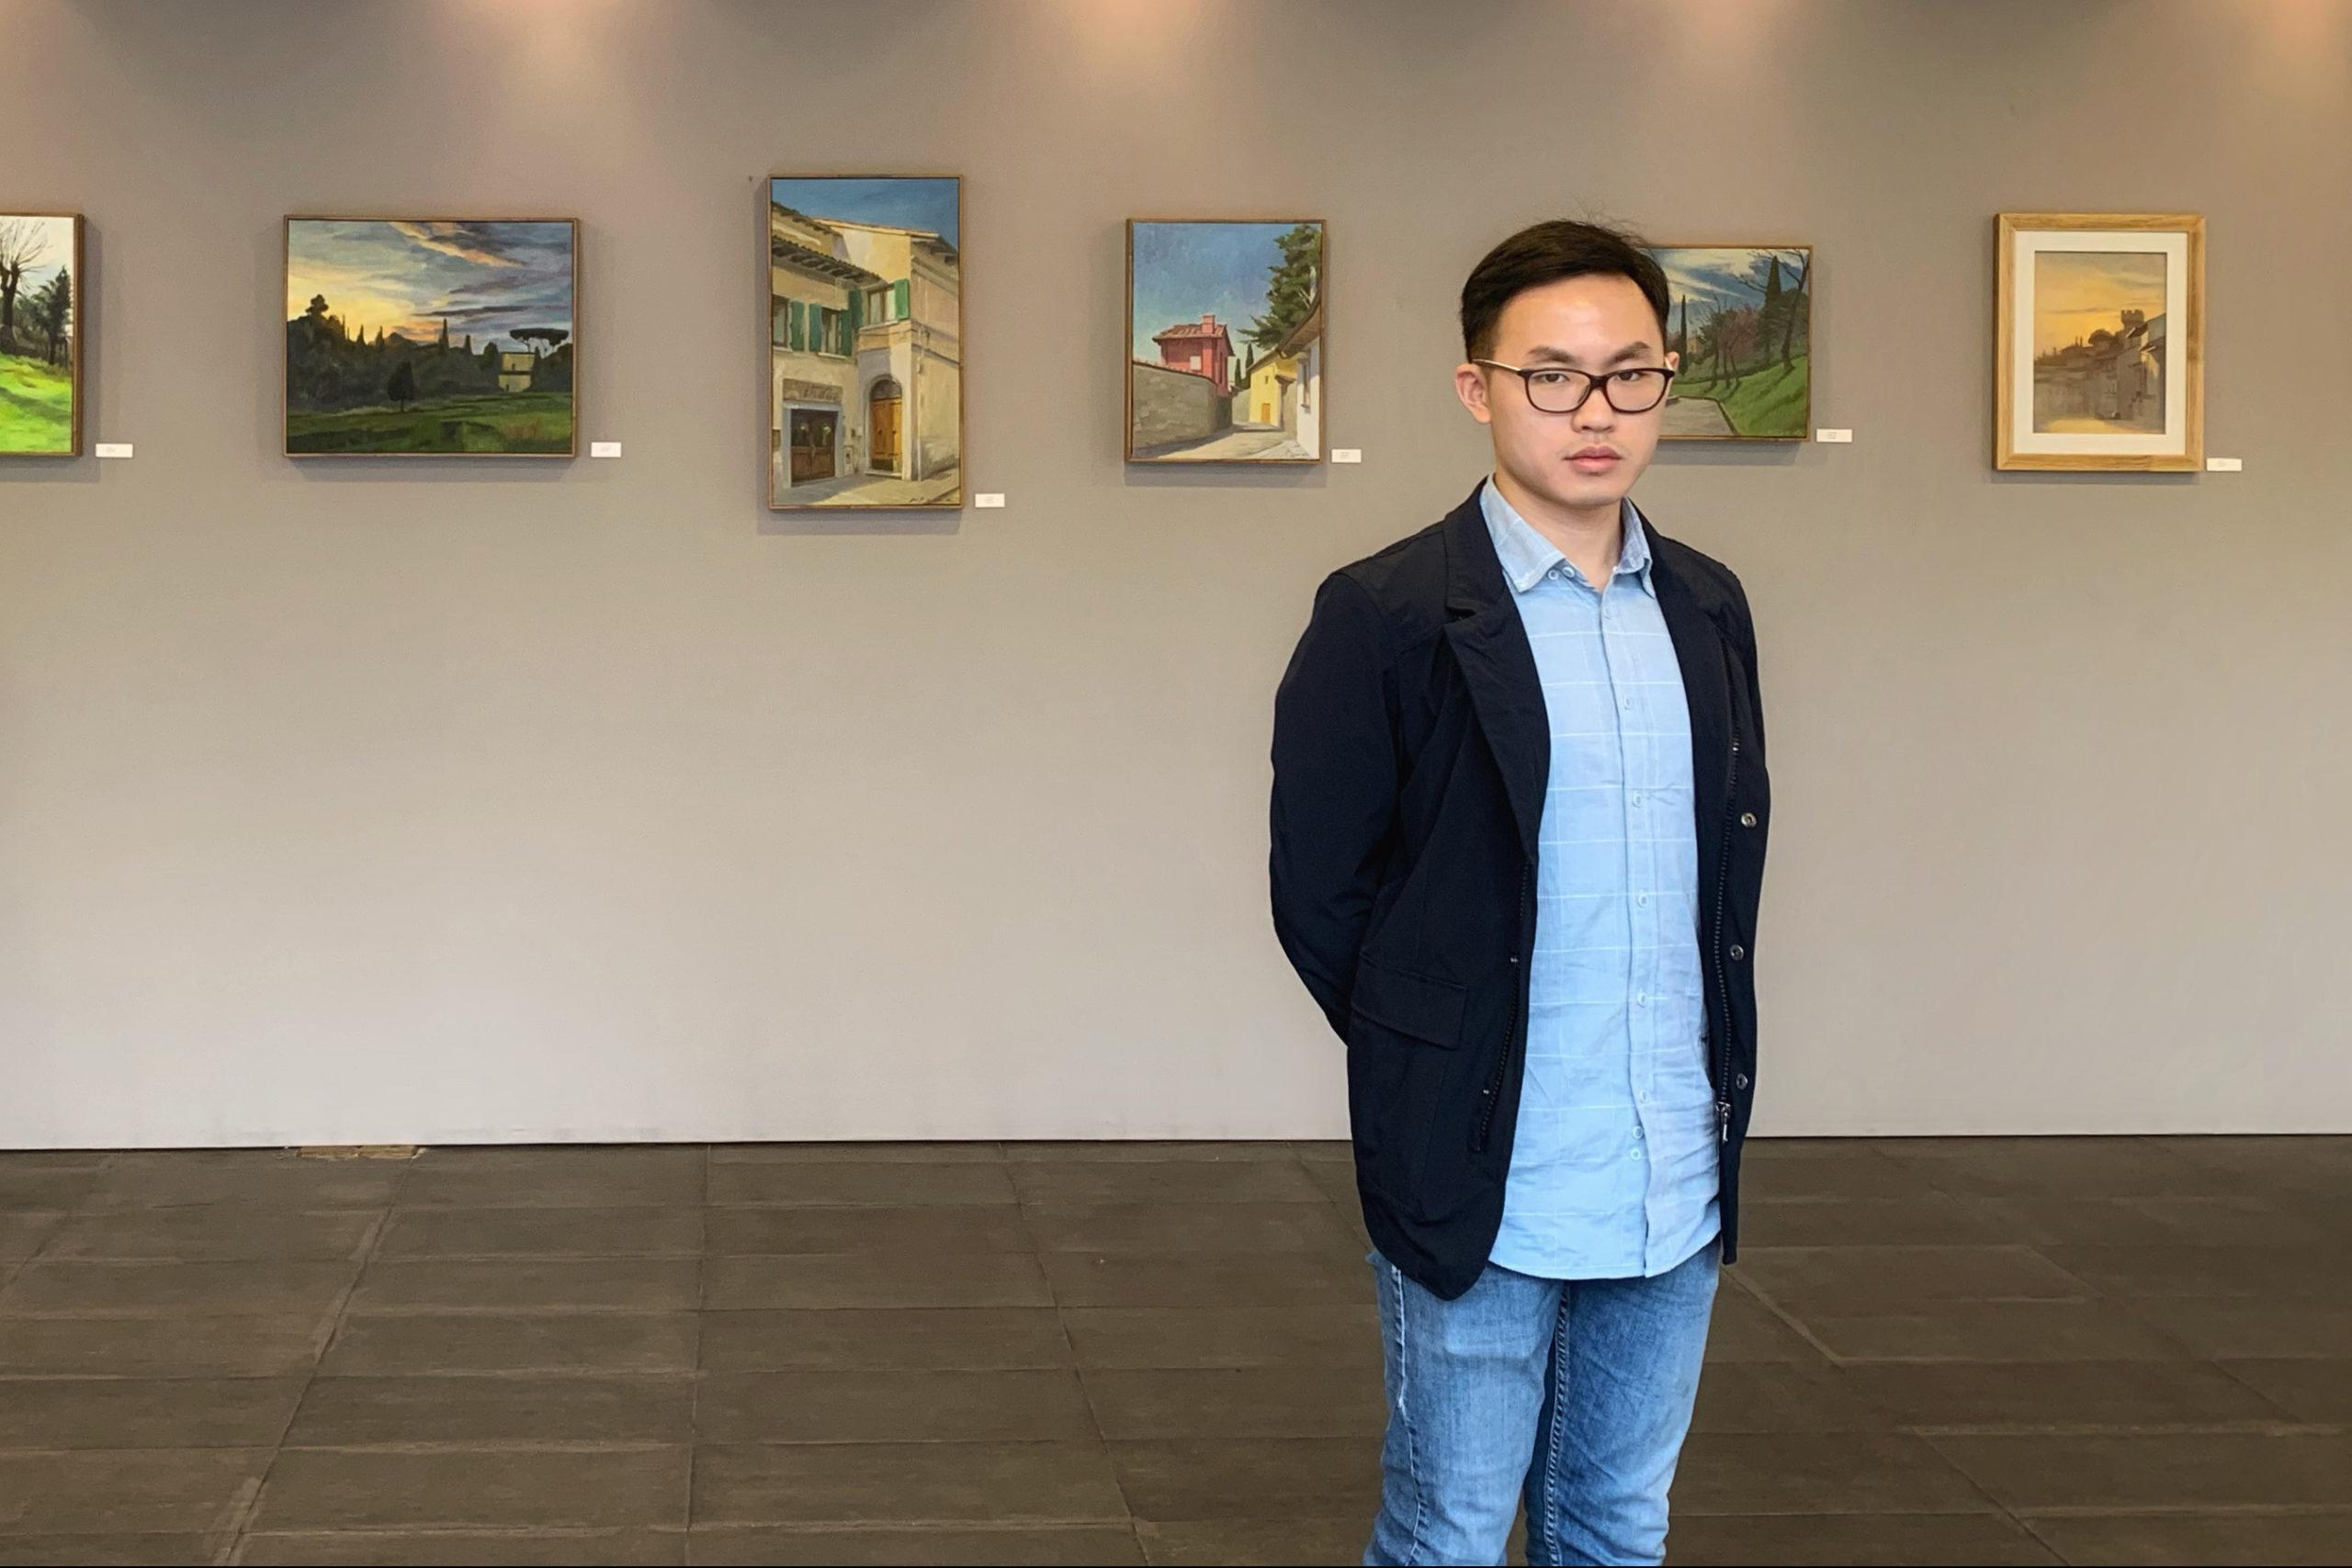 Xiyu, pittore cinese, disciplina e generosità: esce di casa ogni dieci giorni e ha fatto arrivare a Fiesole 4500 mascherine